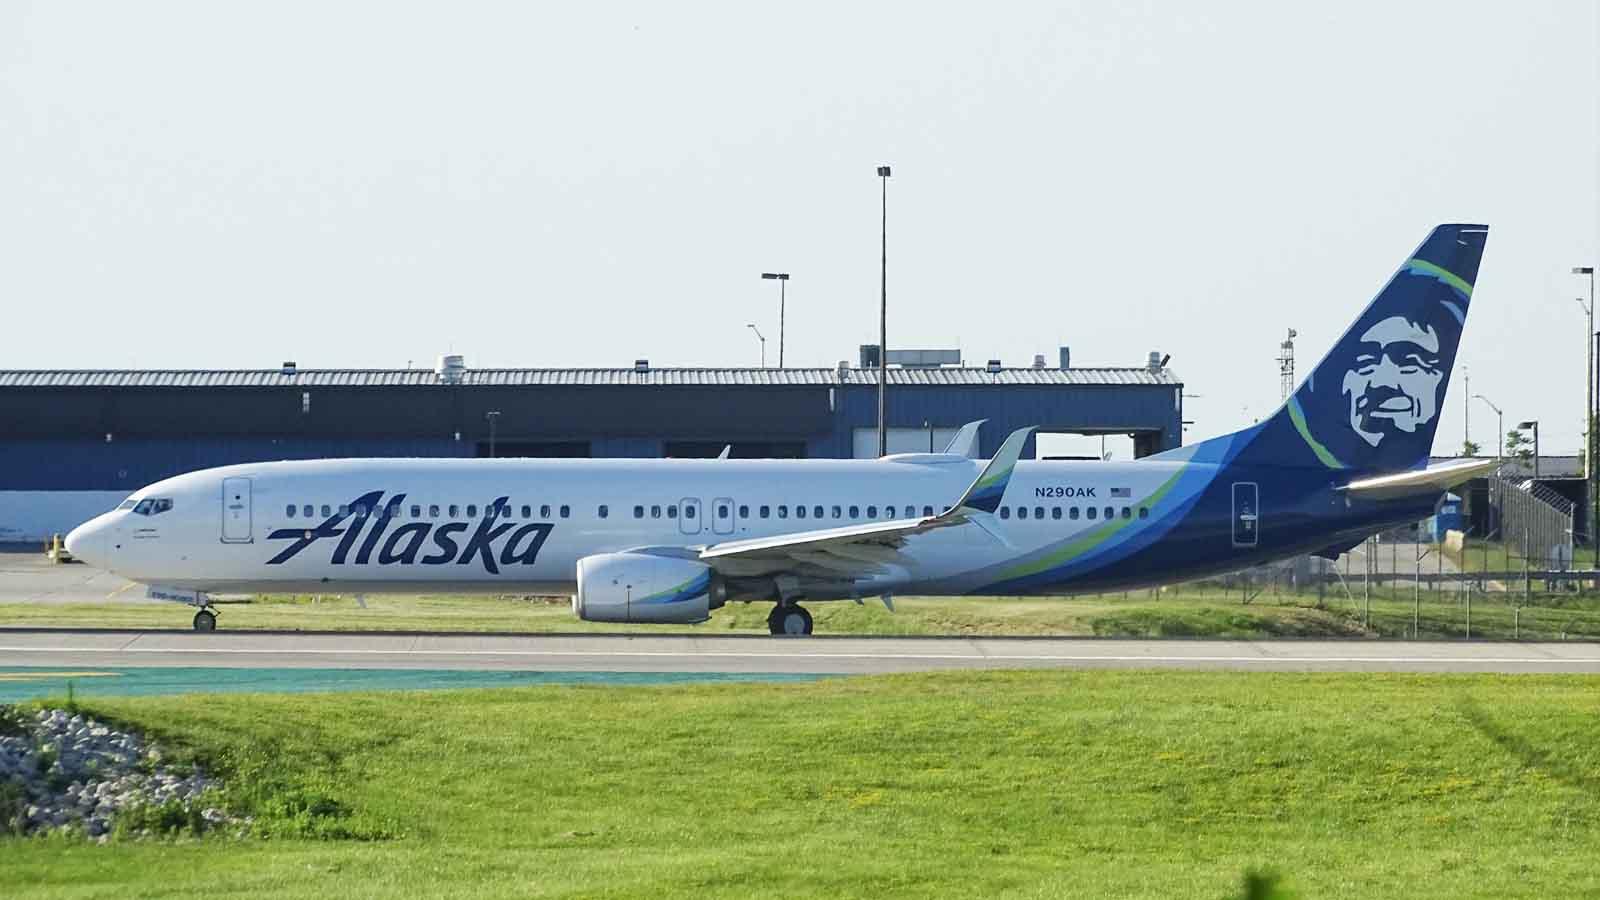 alaska airlines plane on landing strip